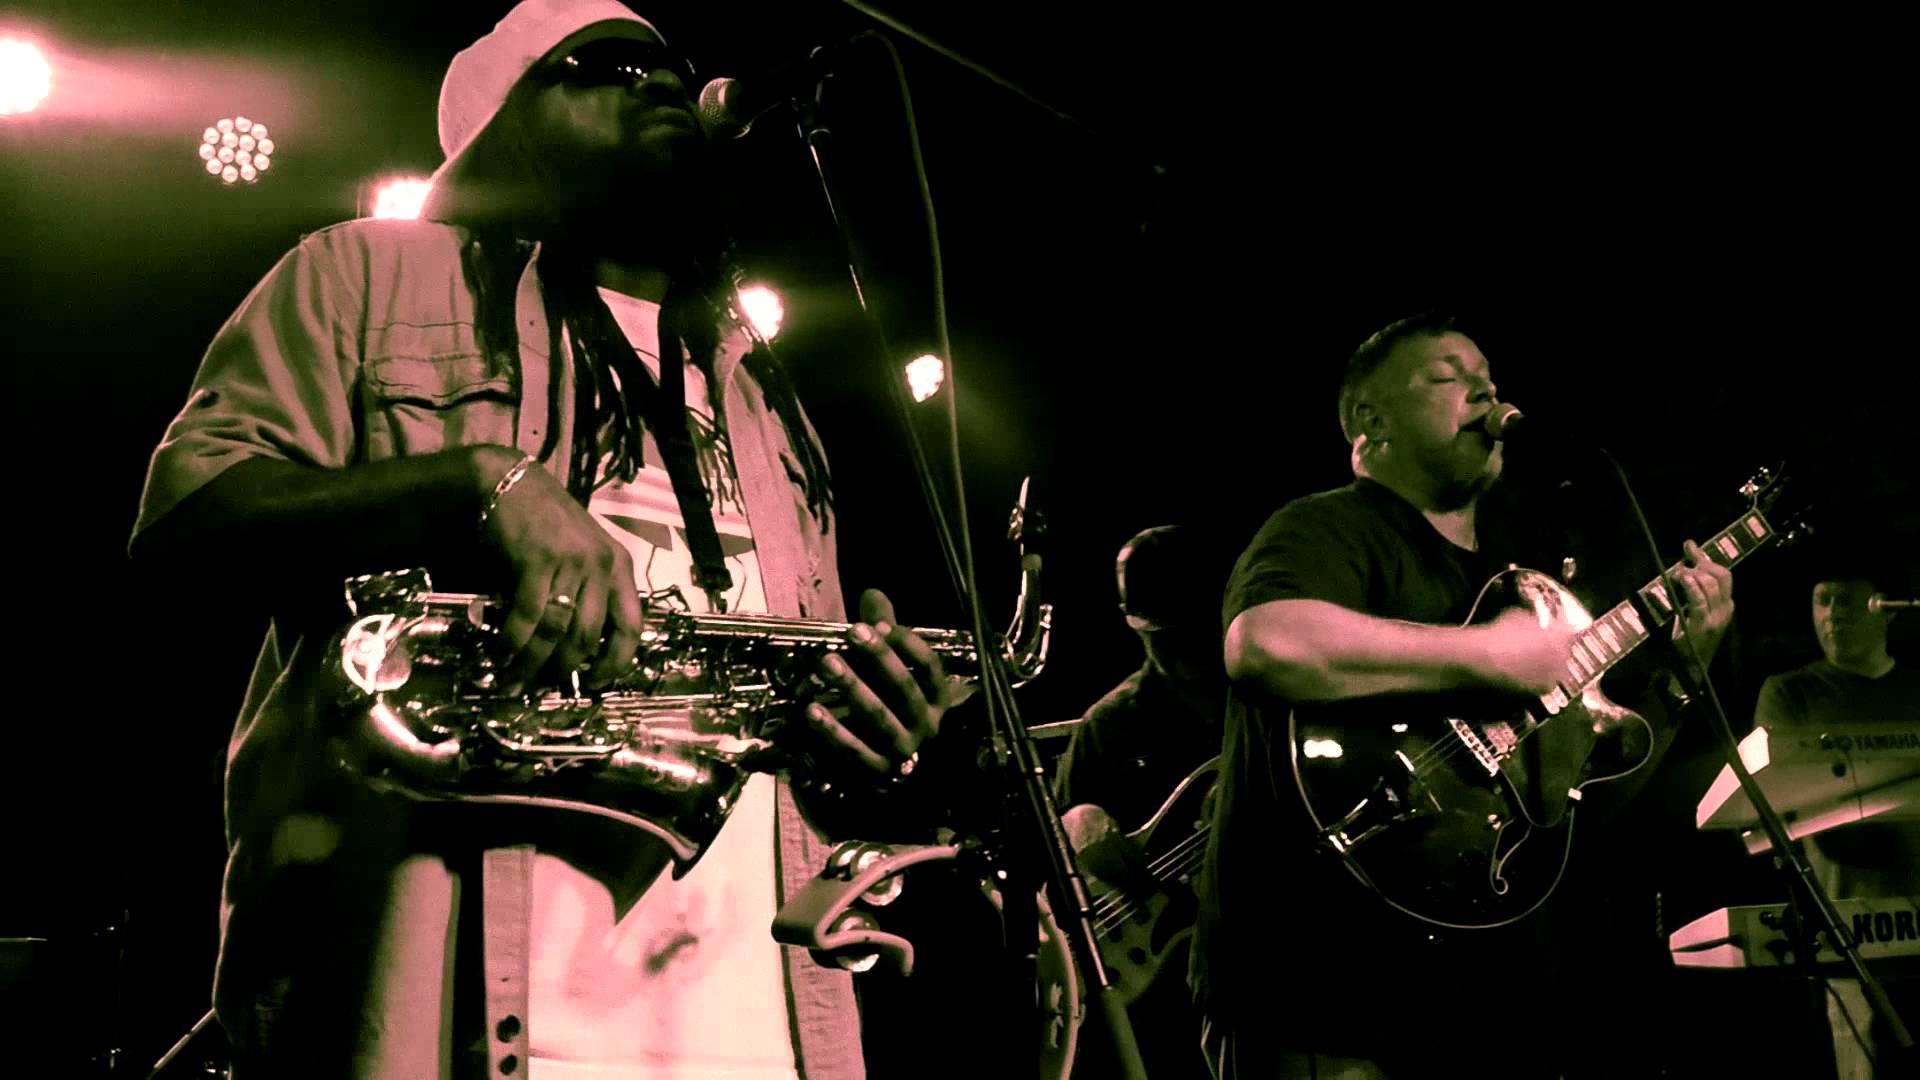 Jah Works @ Gypsy Sally's in Washington, DC [4/10/2015]